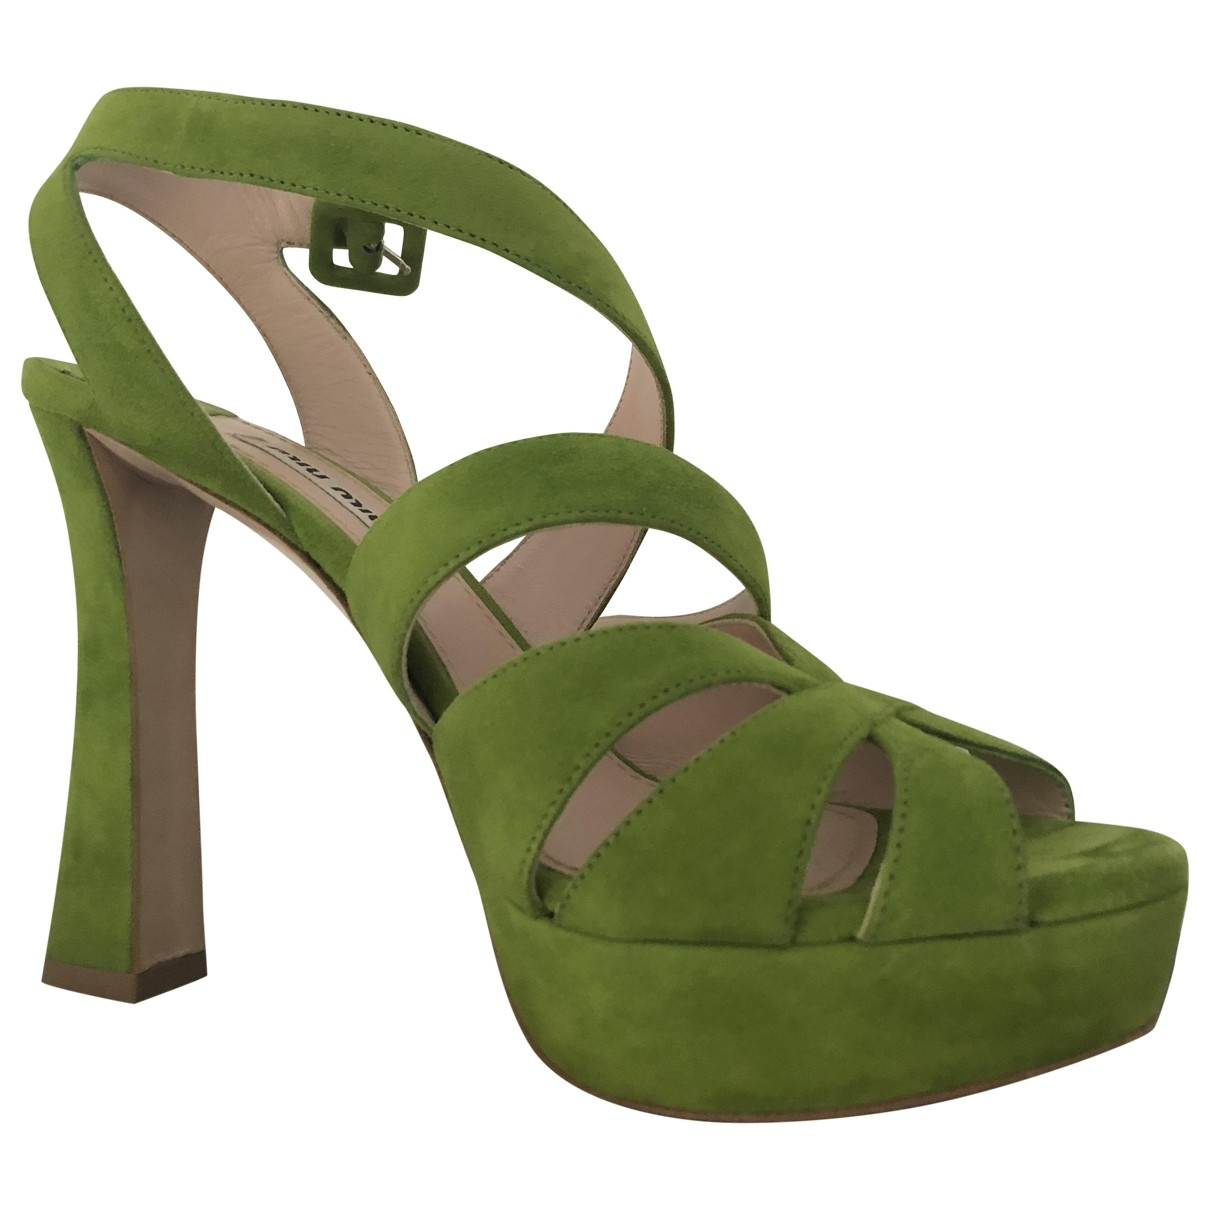 Miu Miu \N Green Suede Sandals for Women 37.5 EU